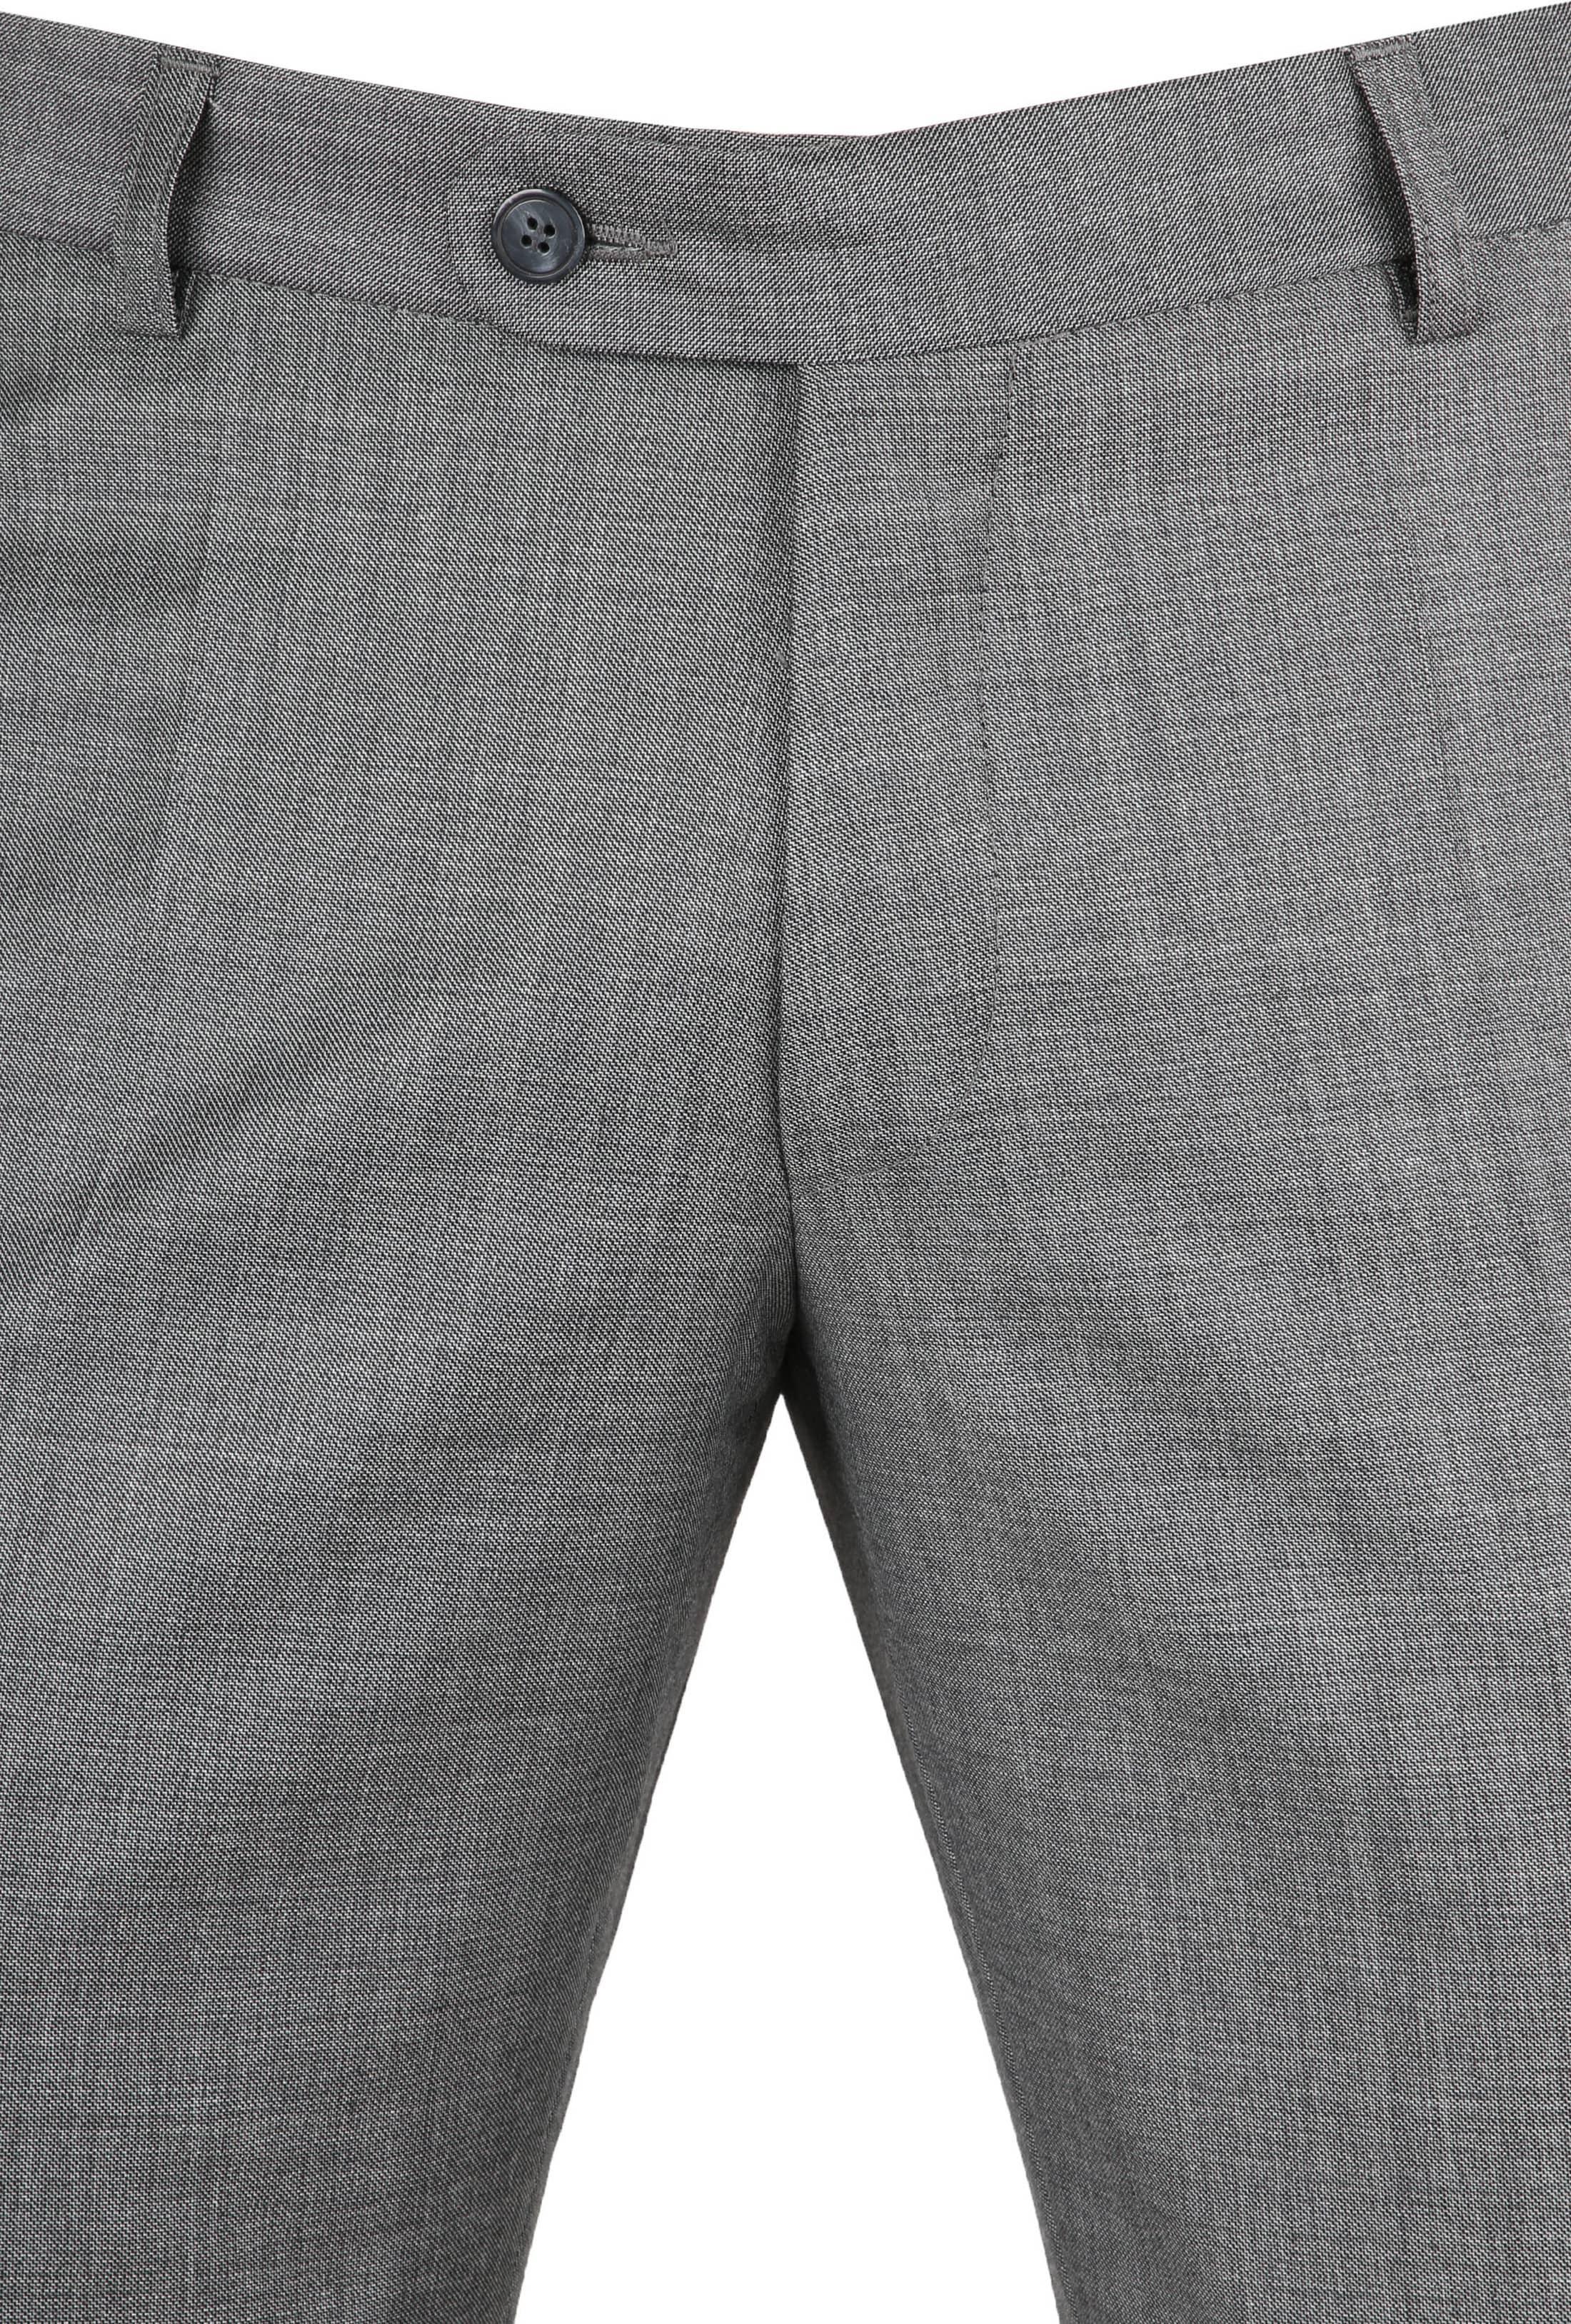 Suitable Pantalon Evans Dark Grey photo 2